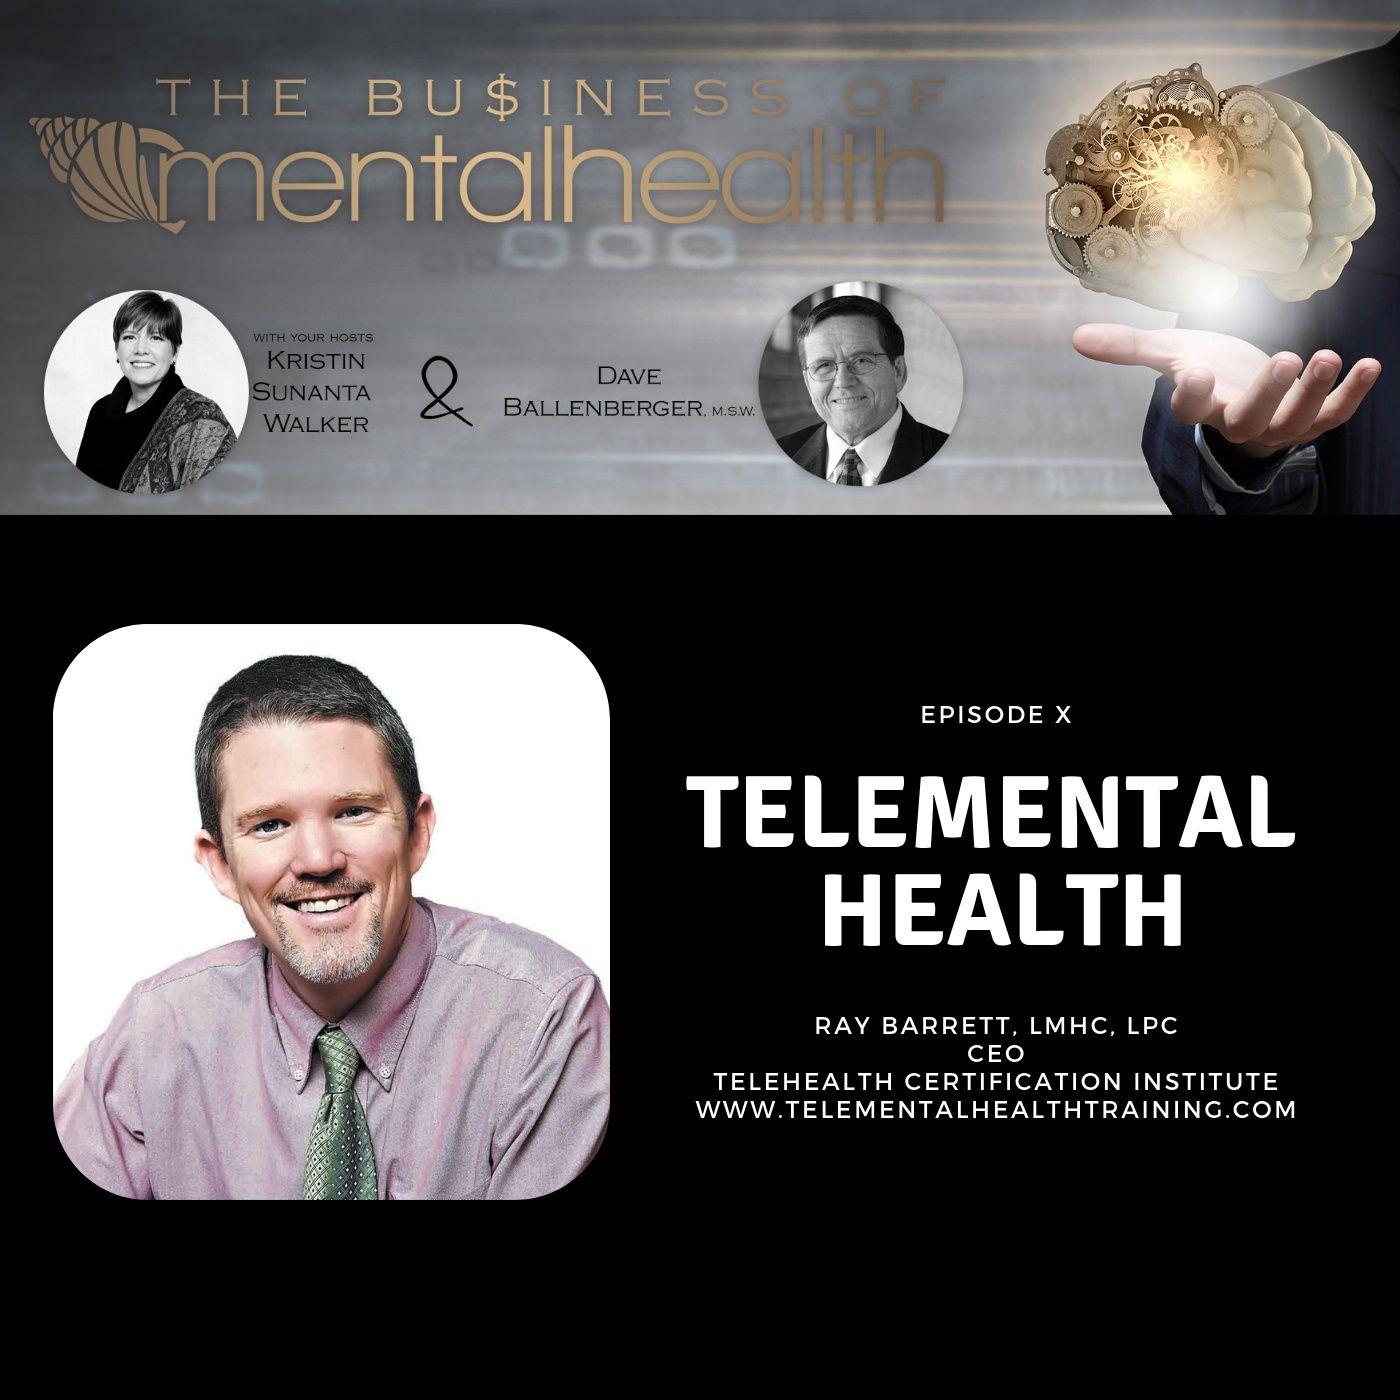 Mental Health News Radio - Mental Health Business: Telemental Health